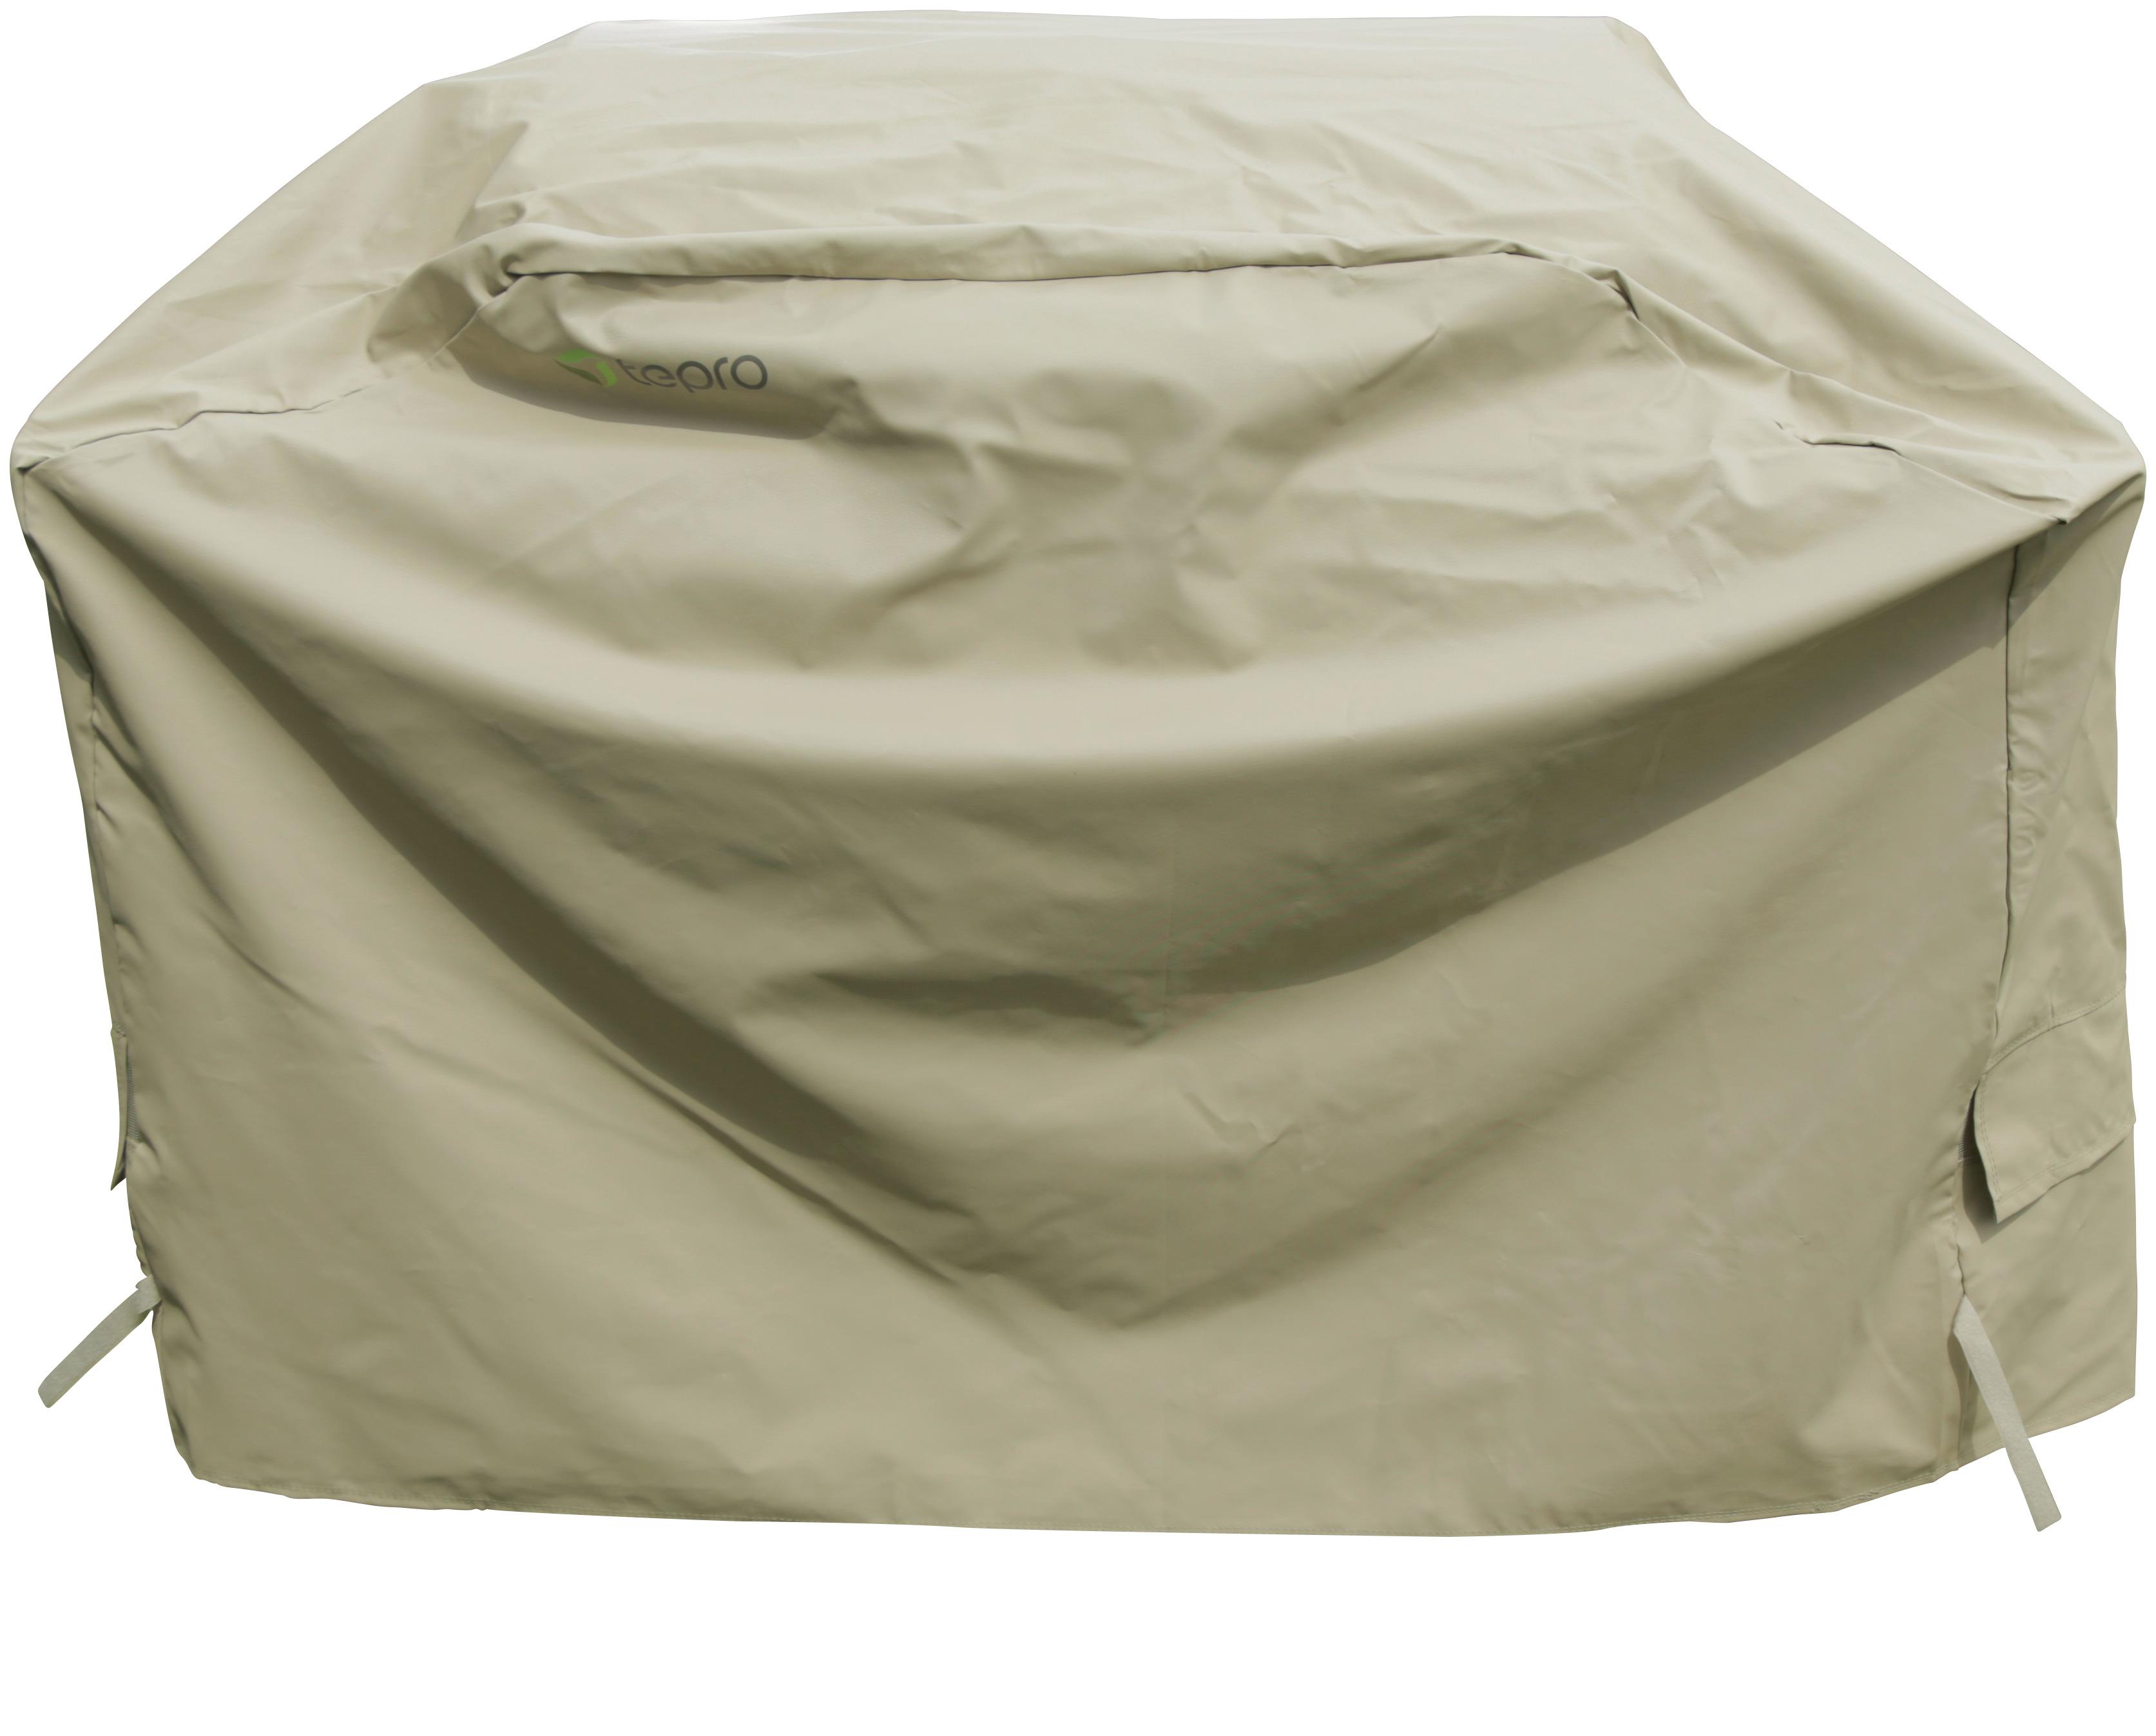 Tepro Toronto Xxl Holzkohlegrill Preisvergleich : Tepro abdeckhaube für holzkohlegrill »toronto xxl« bxt: 150x70 cm